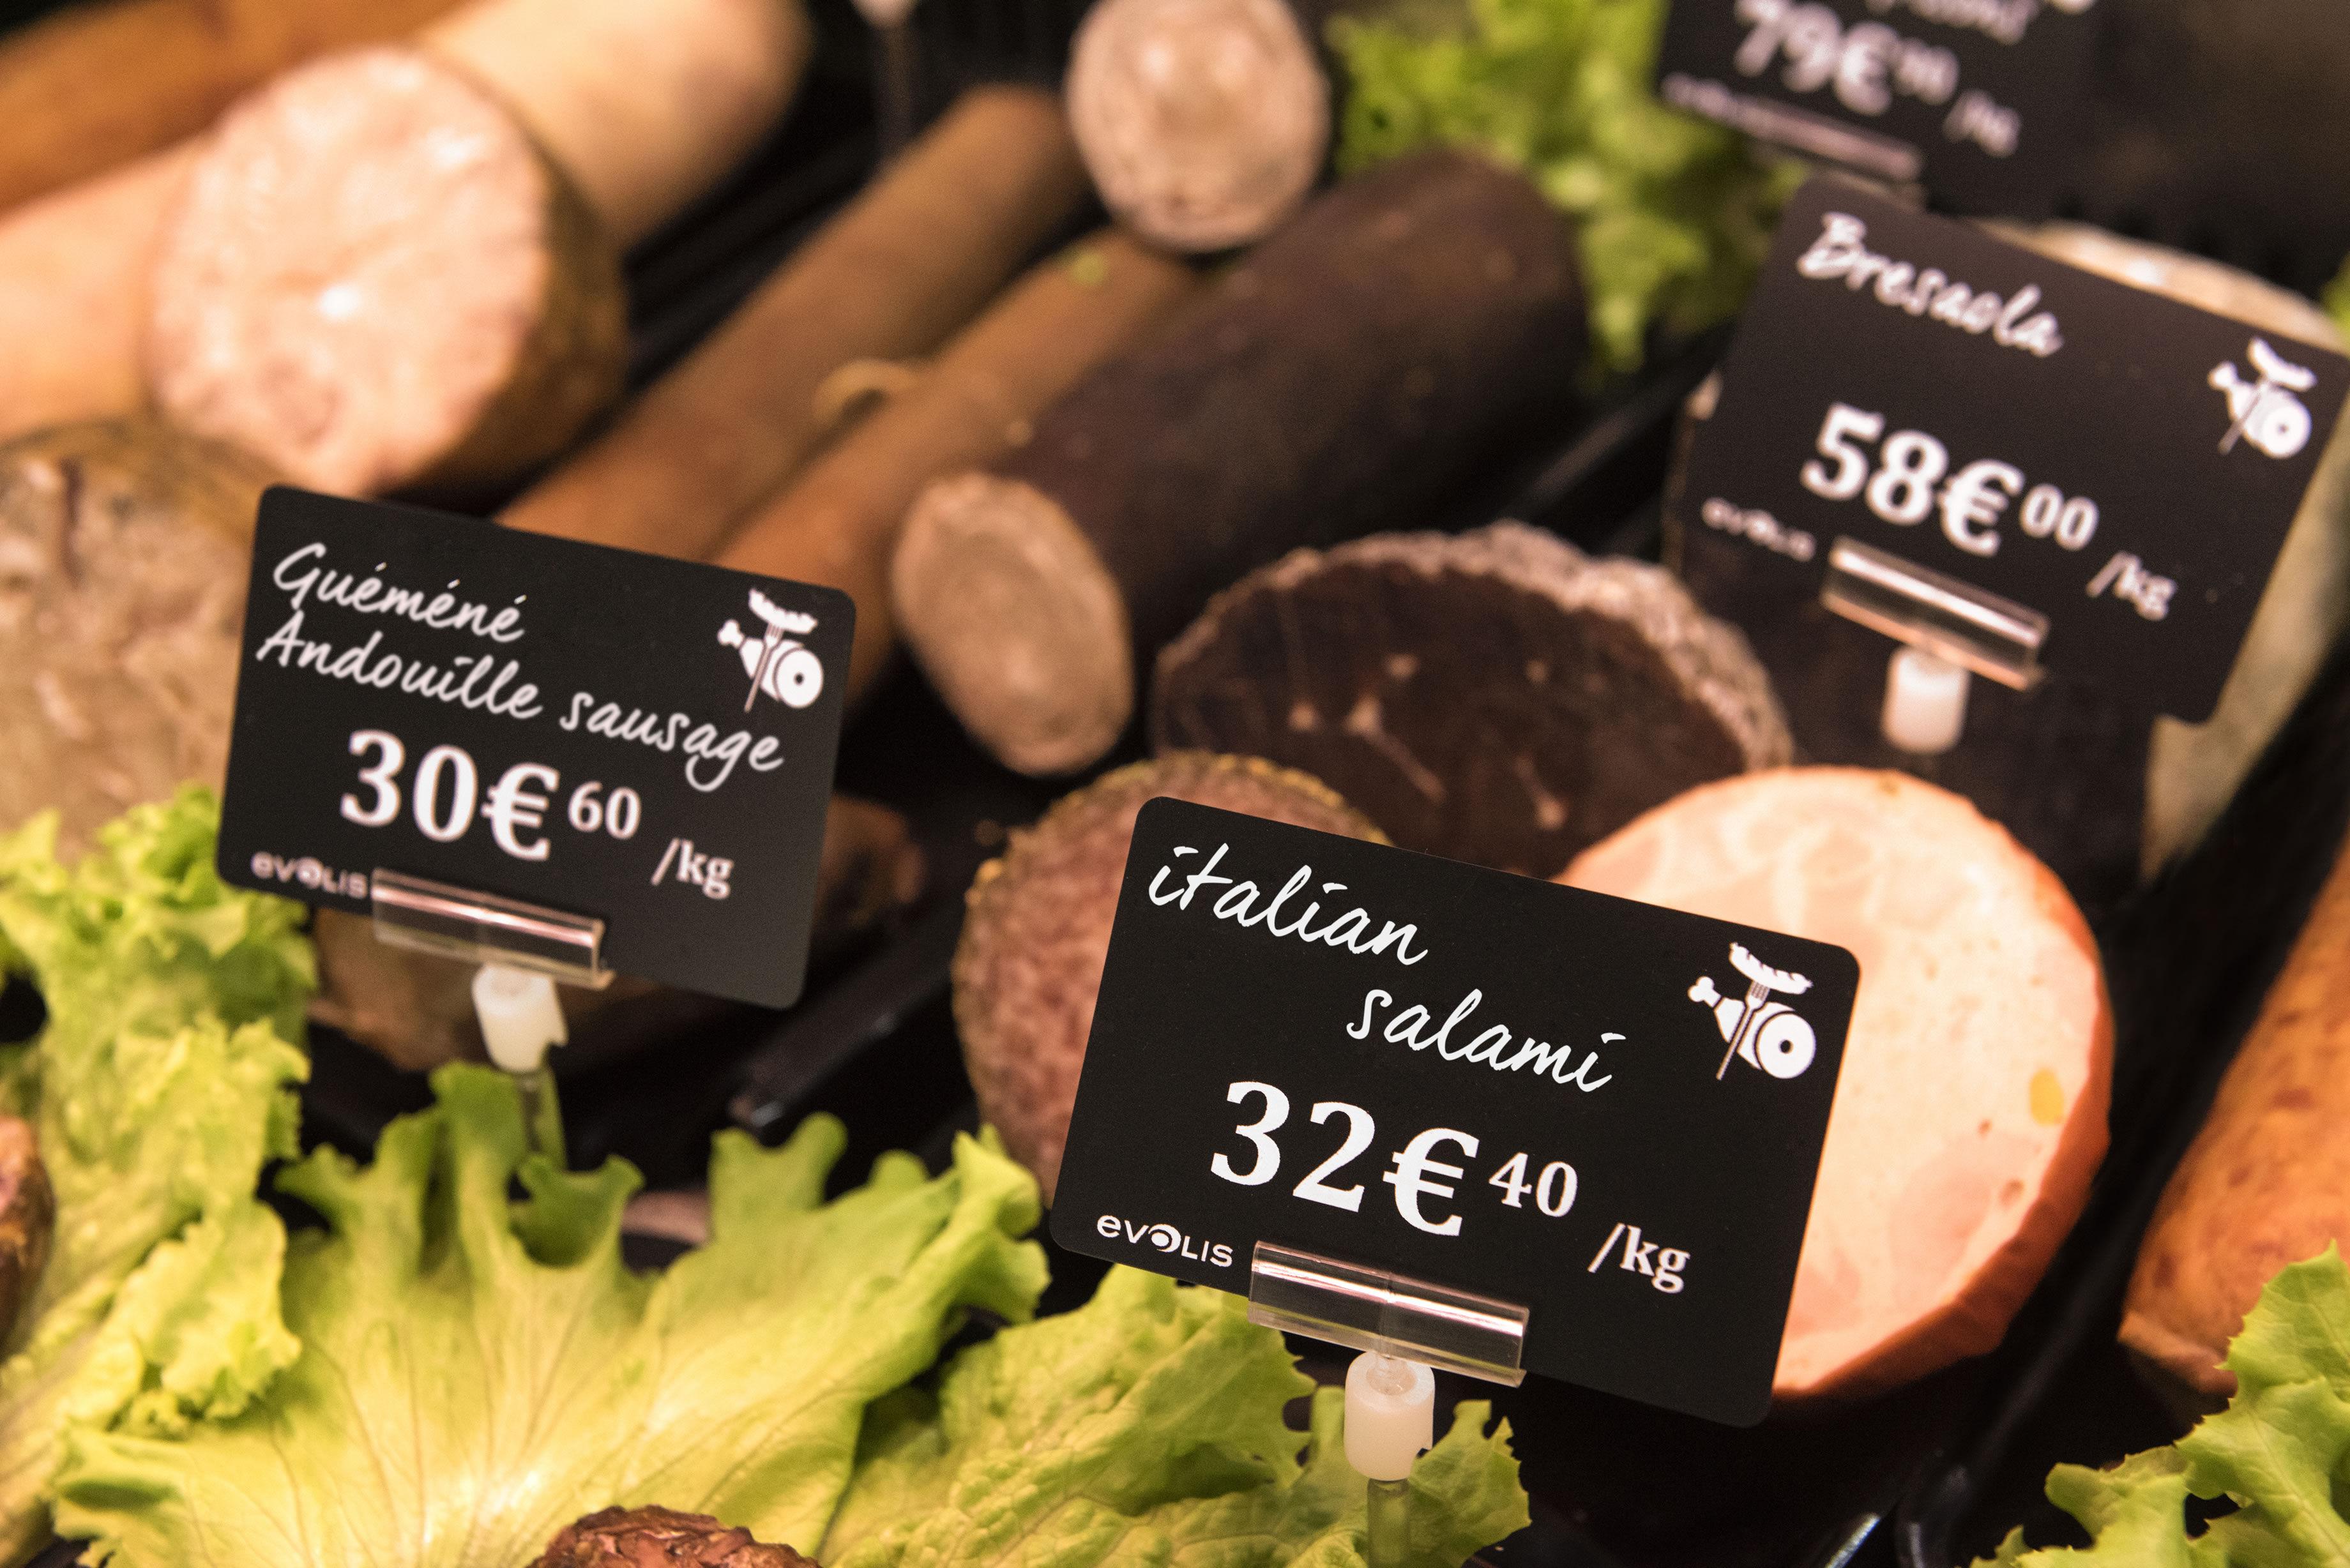 Salami Price Tag created by Edikio food label printers